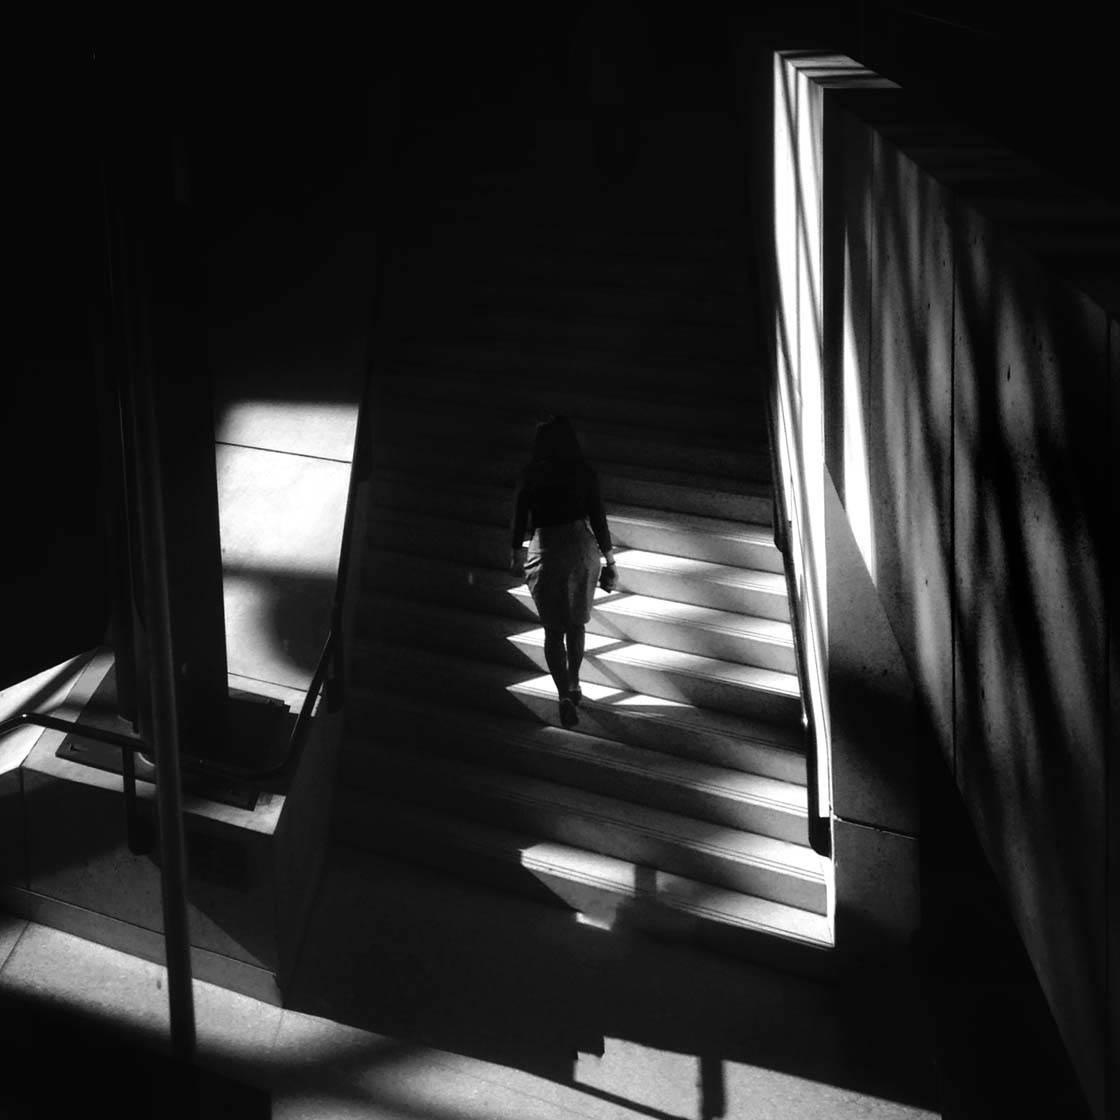 10585_Shadow-iPhone-Photos-26_w1120